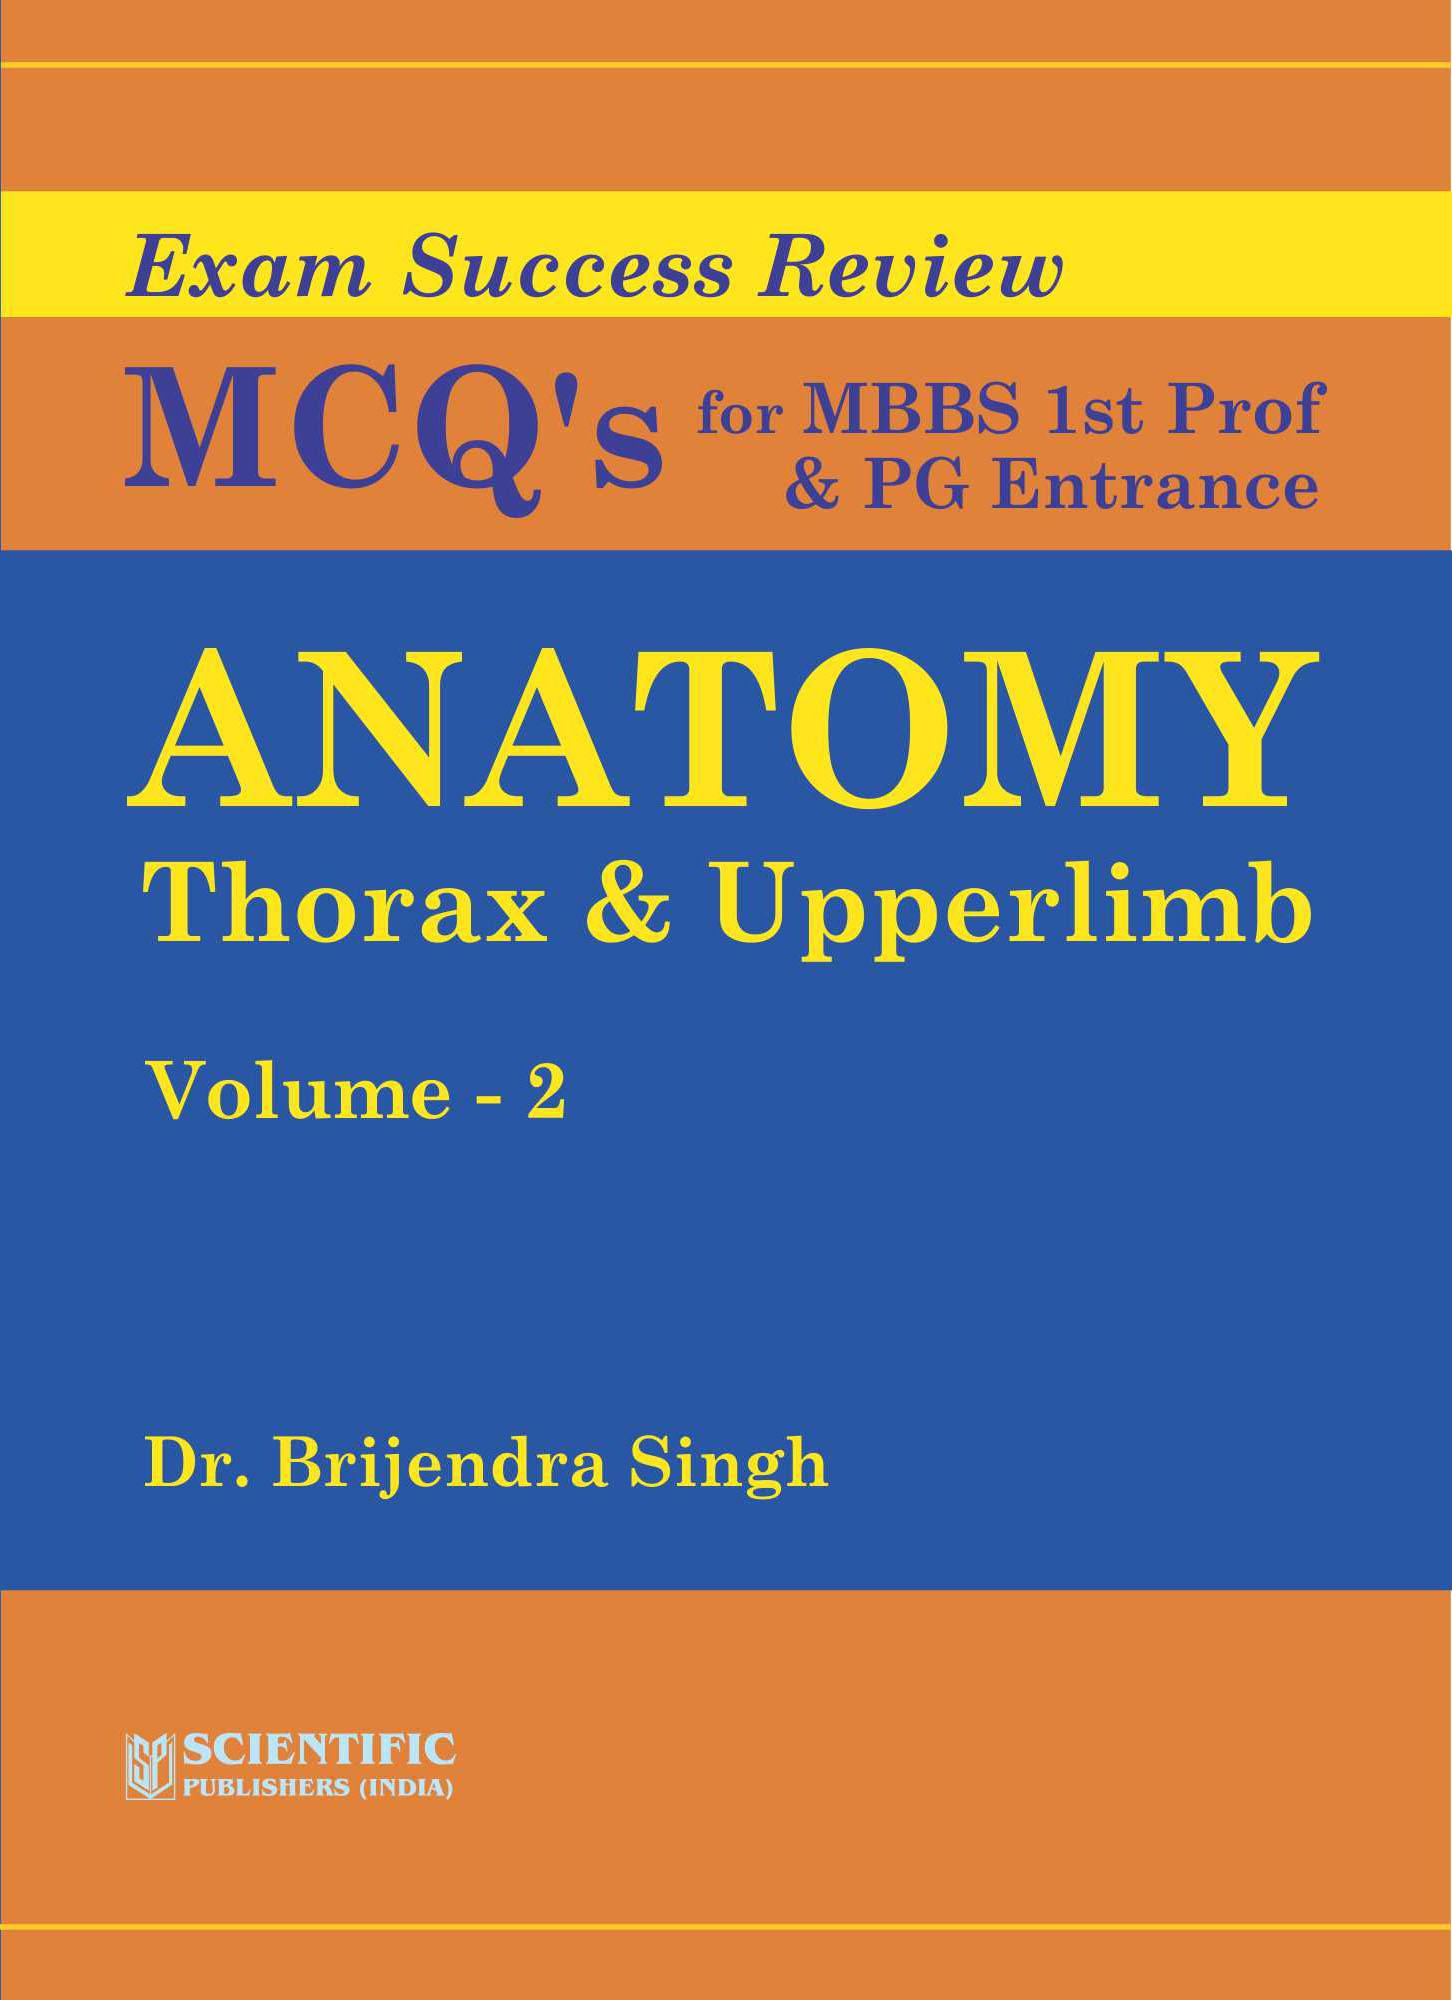 anatomy-thorax-and-upperlimb-vol-2